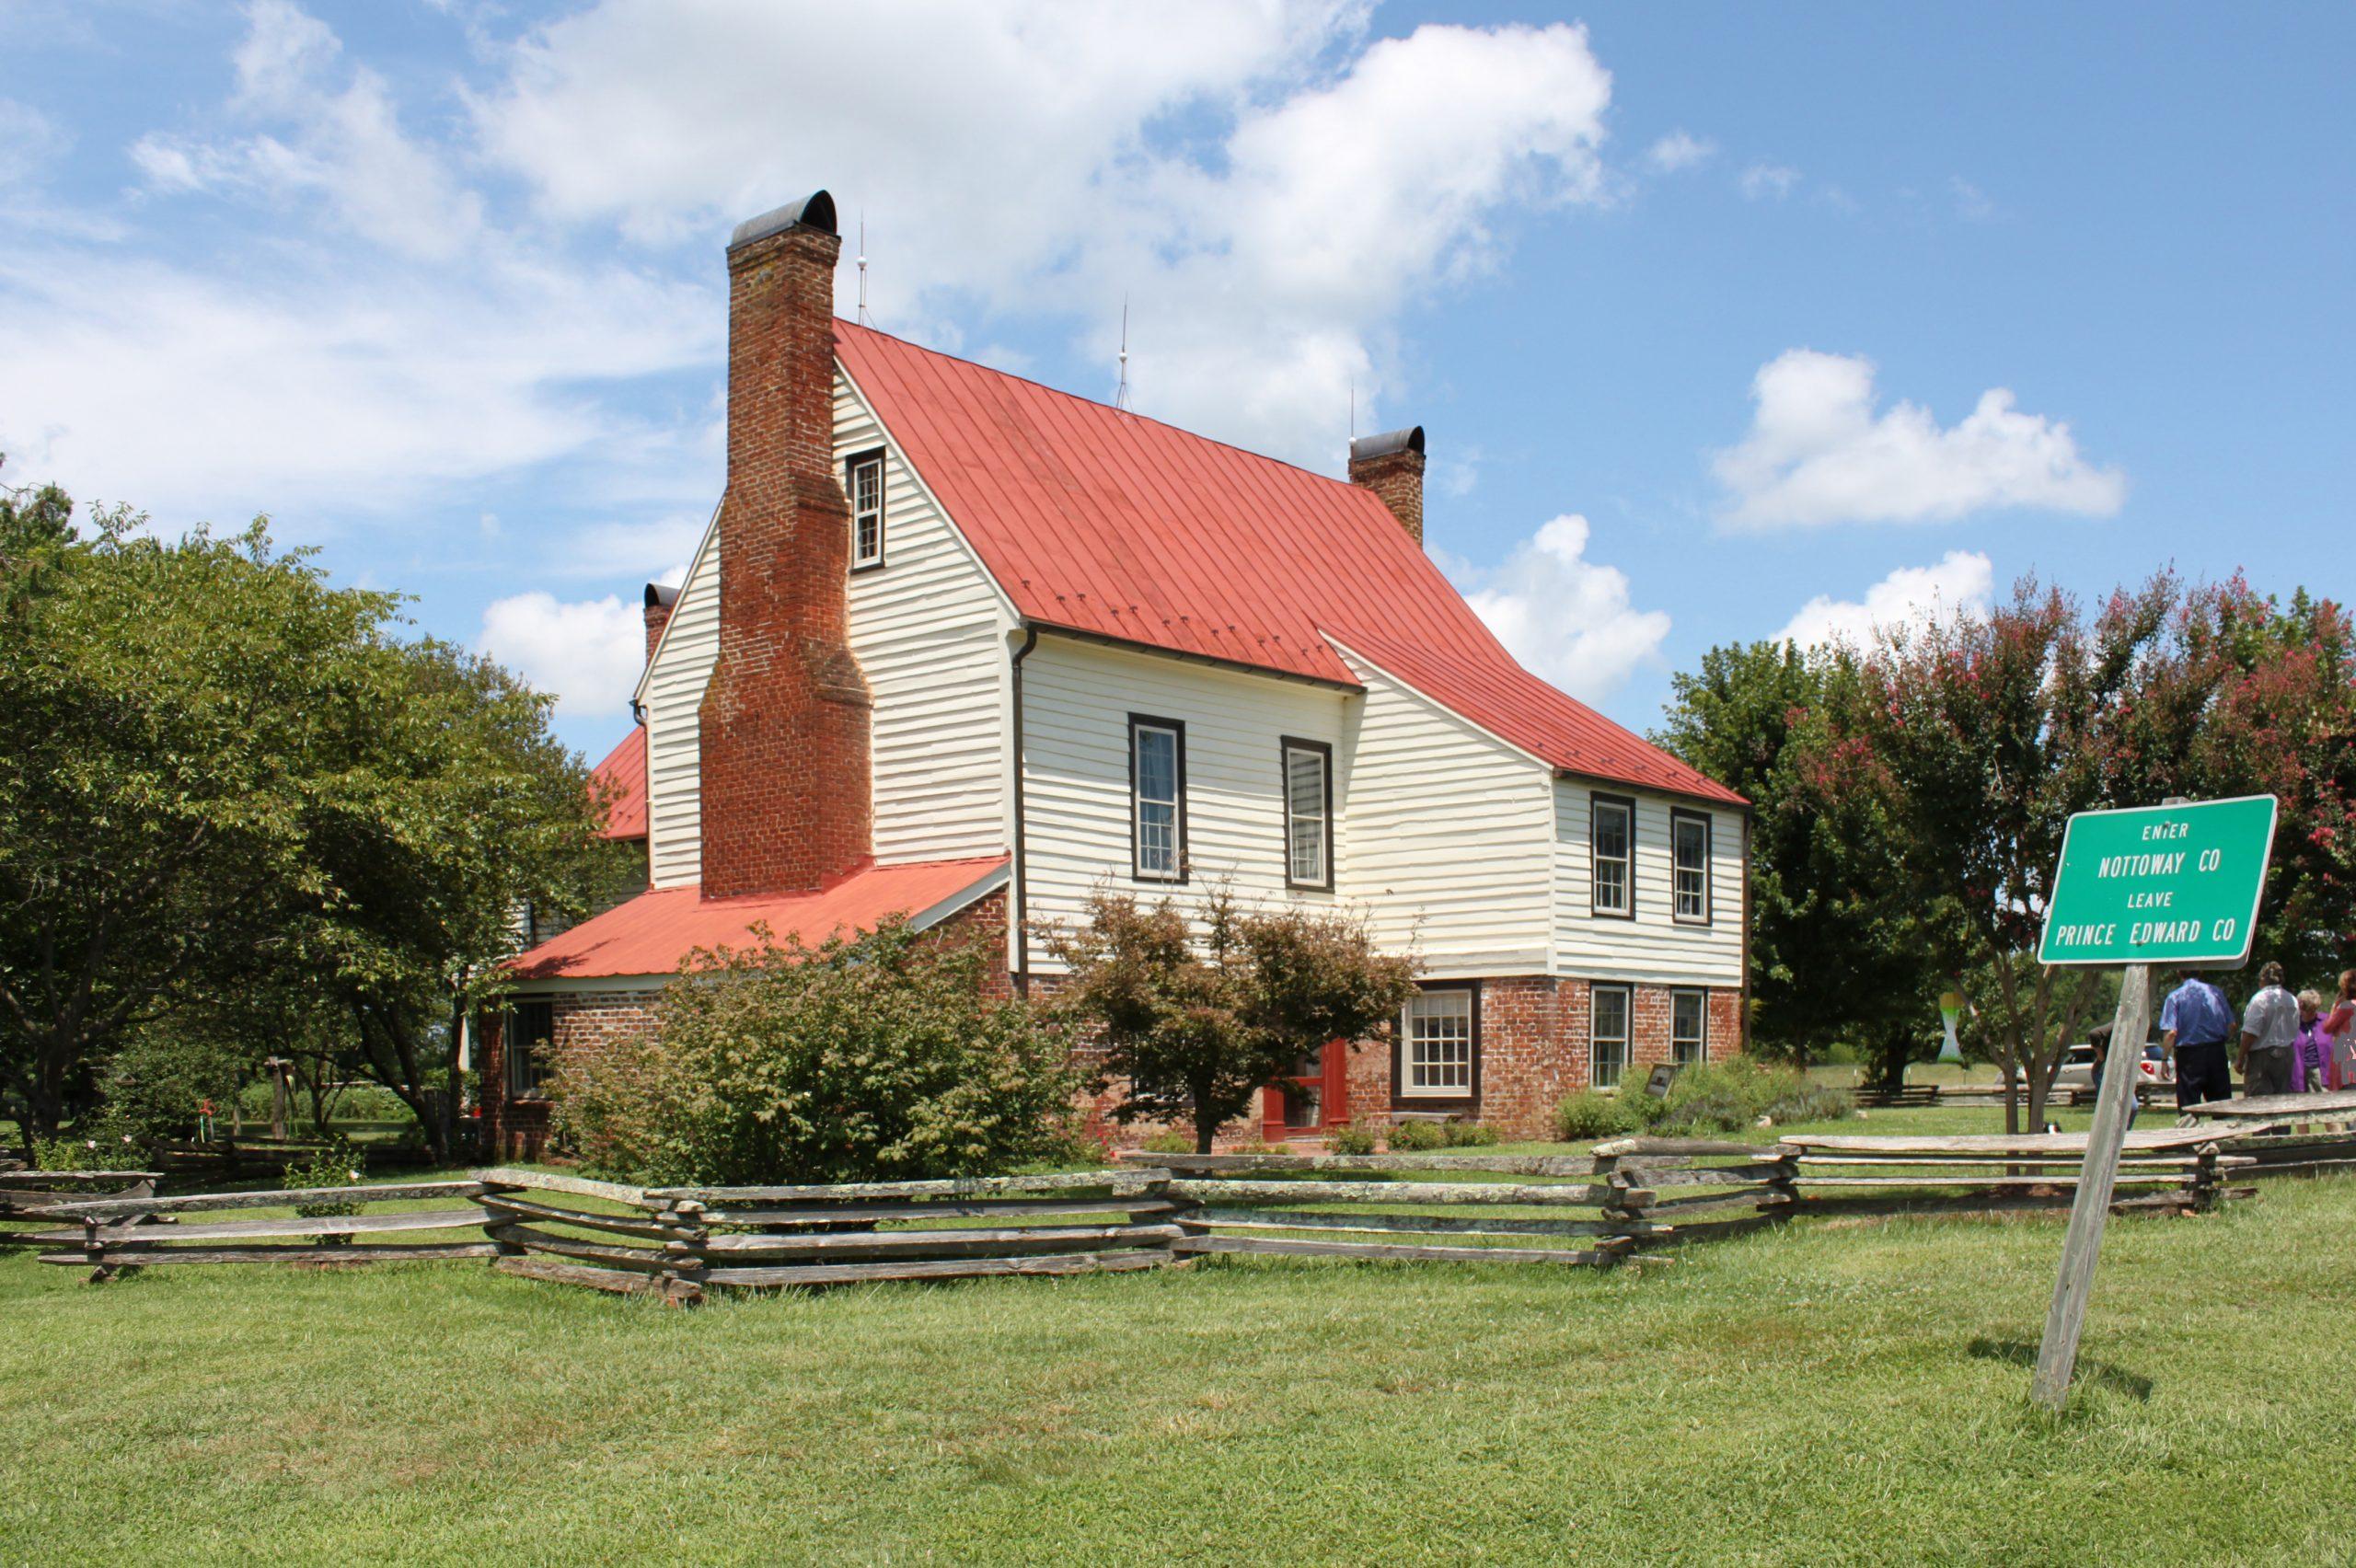 Burke's Tavern